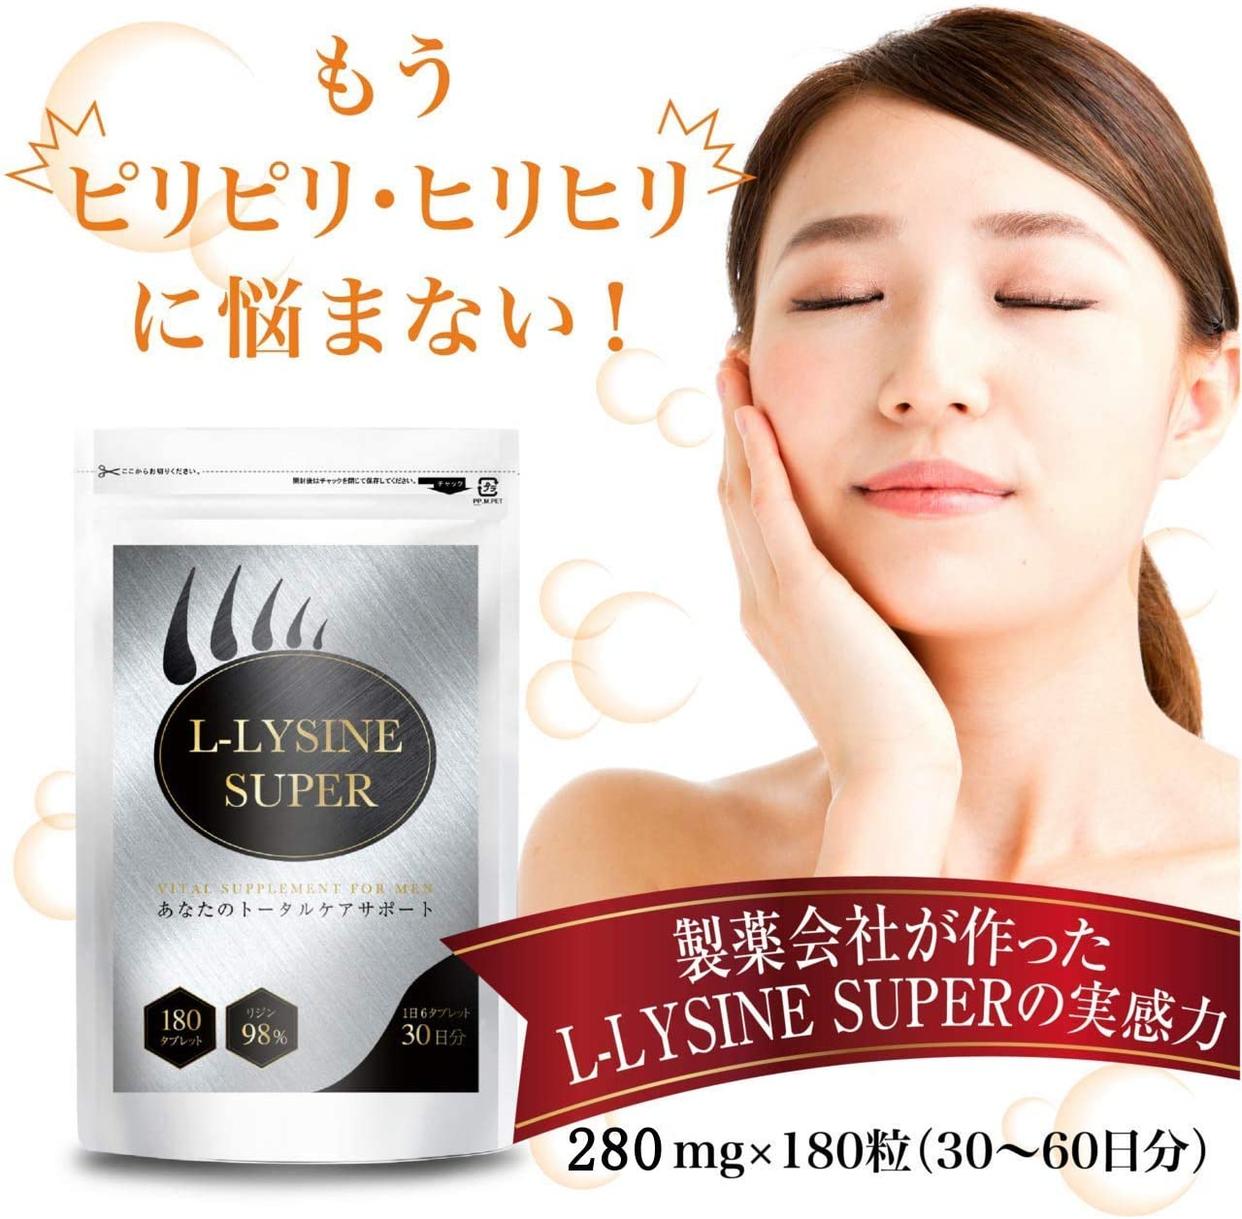 RISEONE(ライズワン) L-LYSINE SUPERの商品画像2